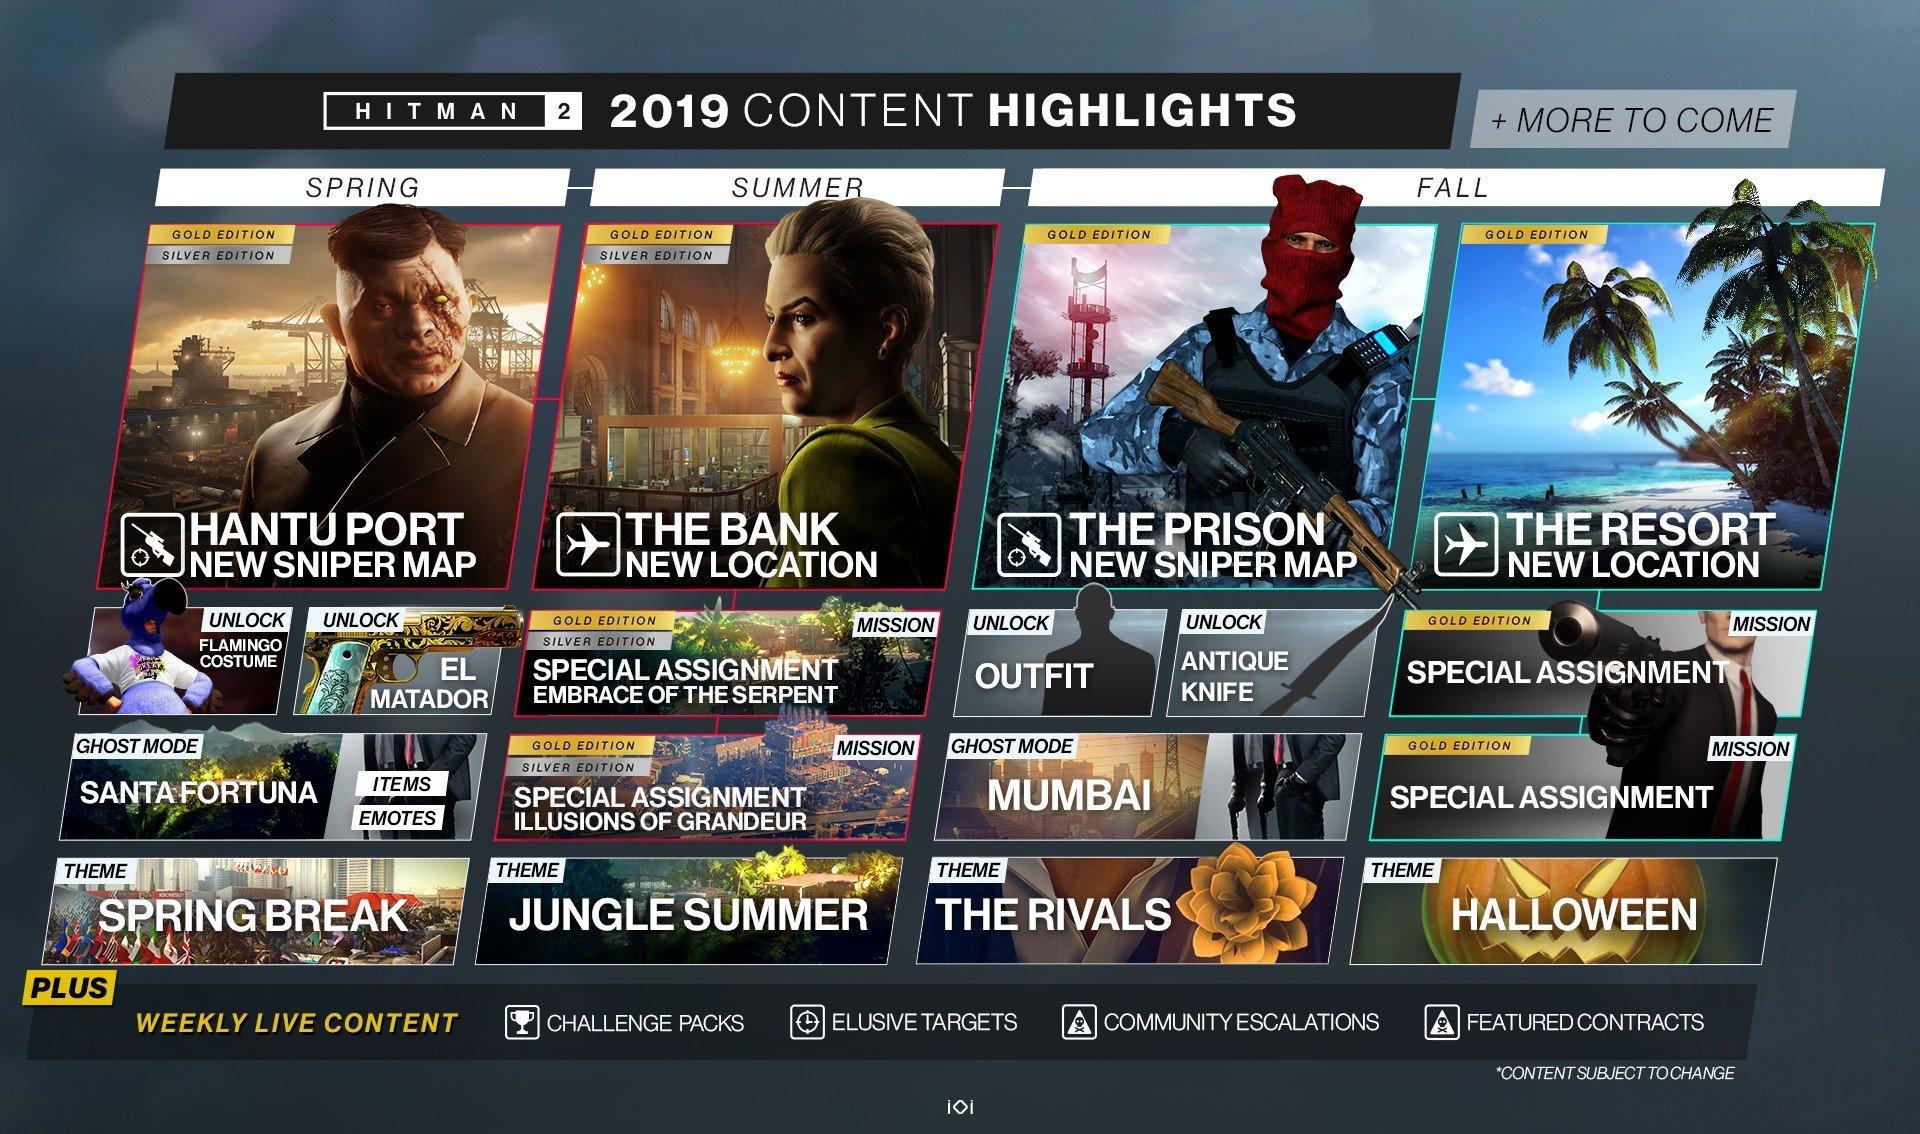 Hitman 2 content roadmap announced - Gematsu